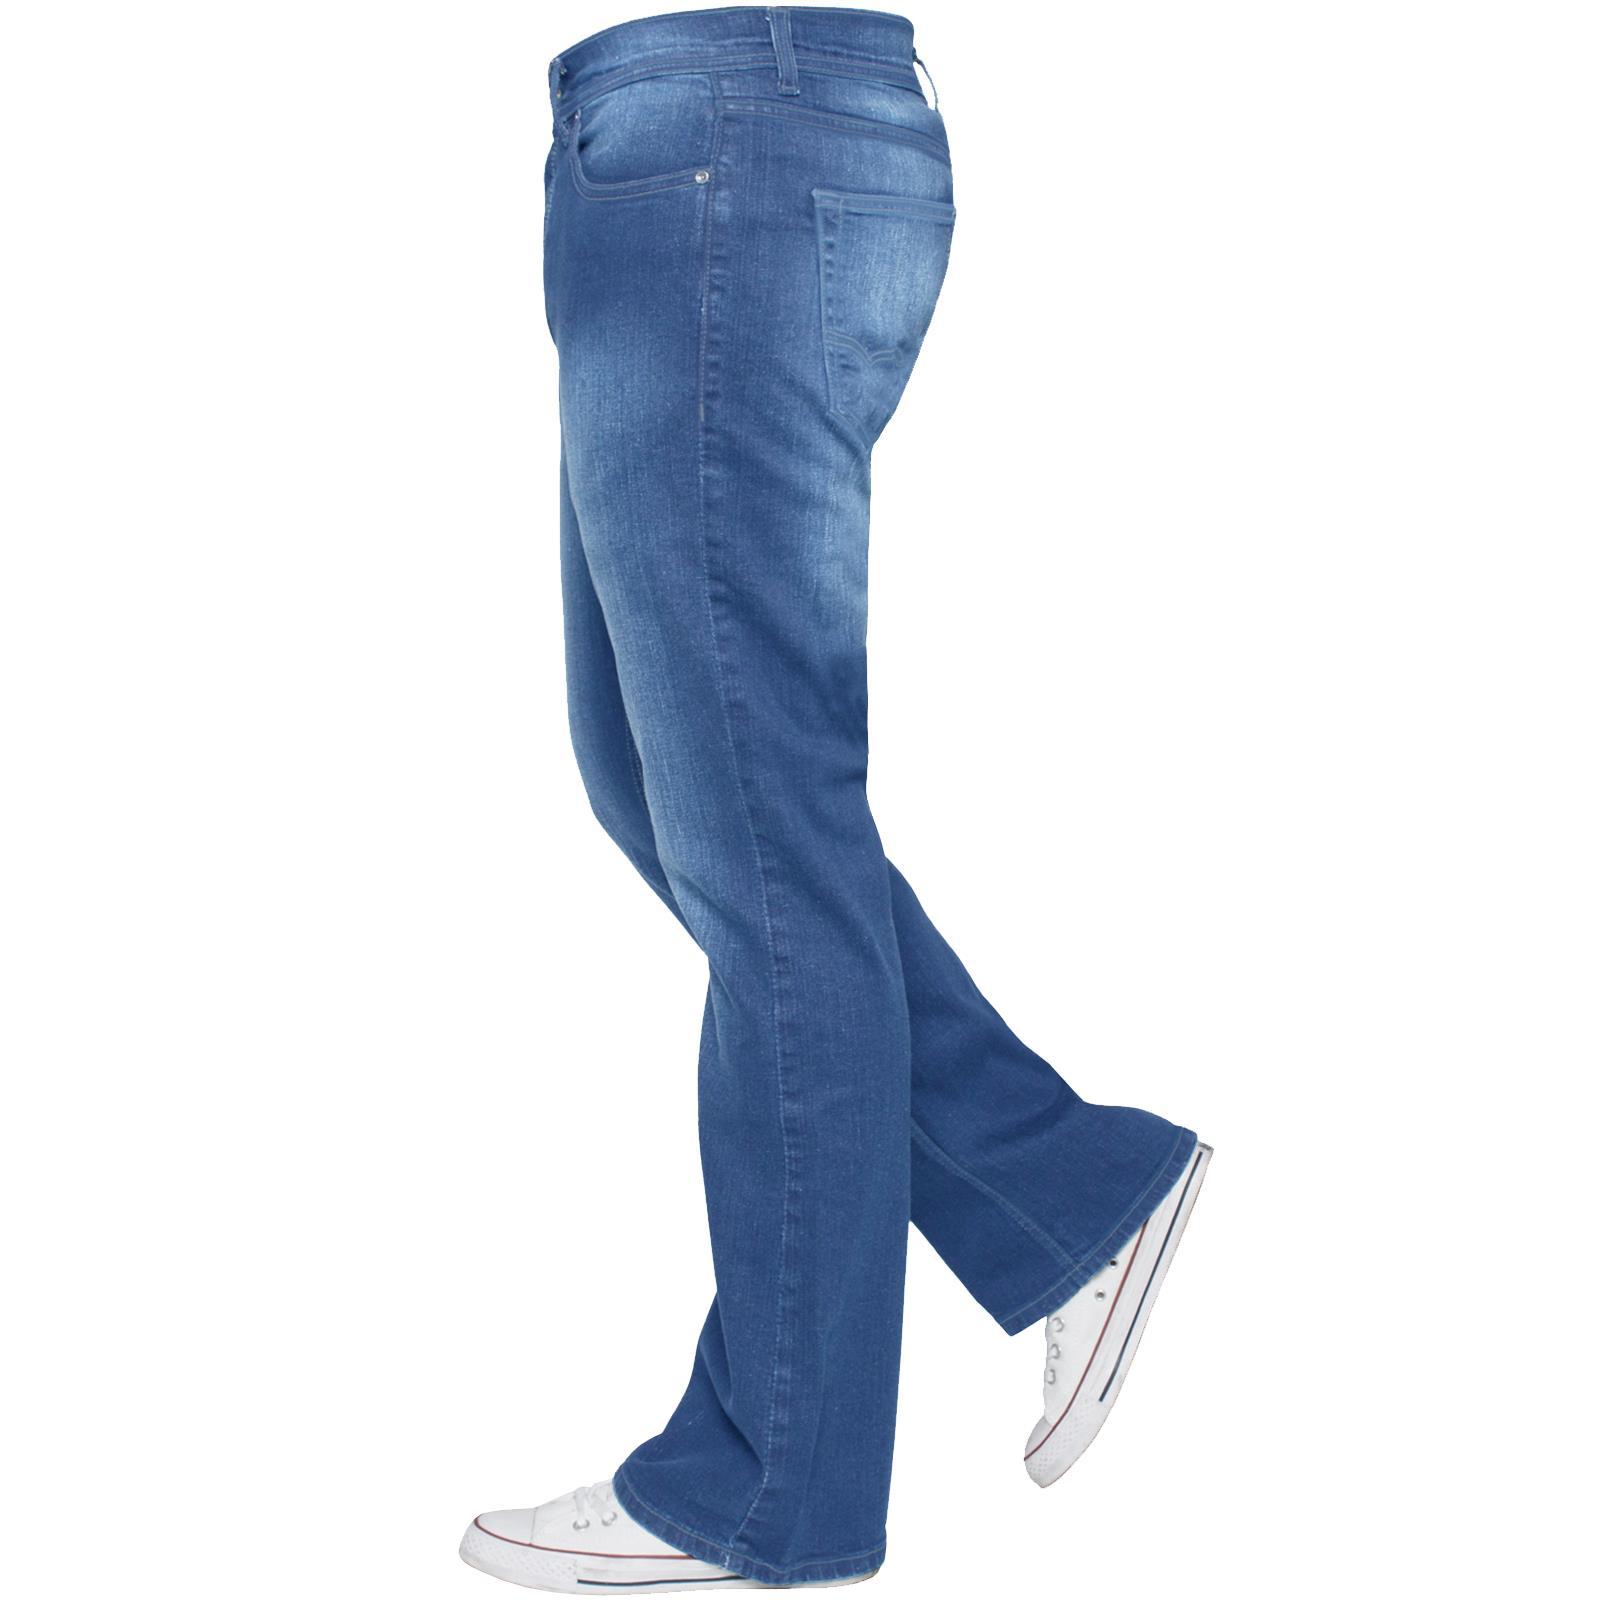 Enzo-Mens-Big-Tall-Jeans-Leg-King-Size-Denim-Pants-Chino-Trousers-Pants-44-034-60-034 thumbnail 107